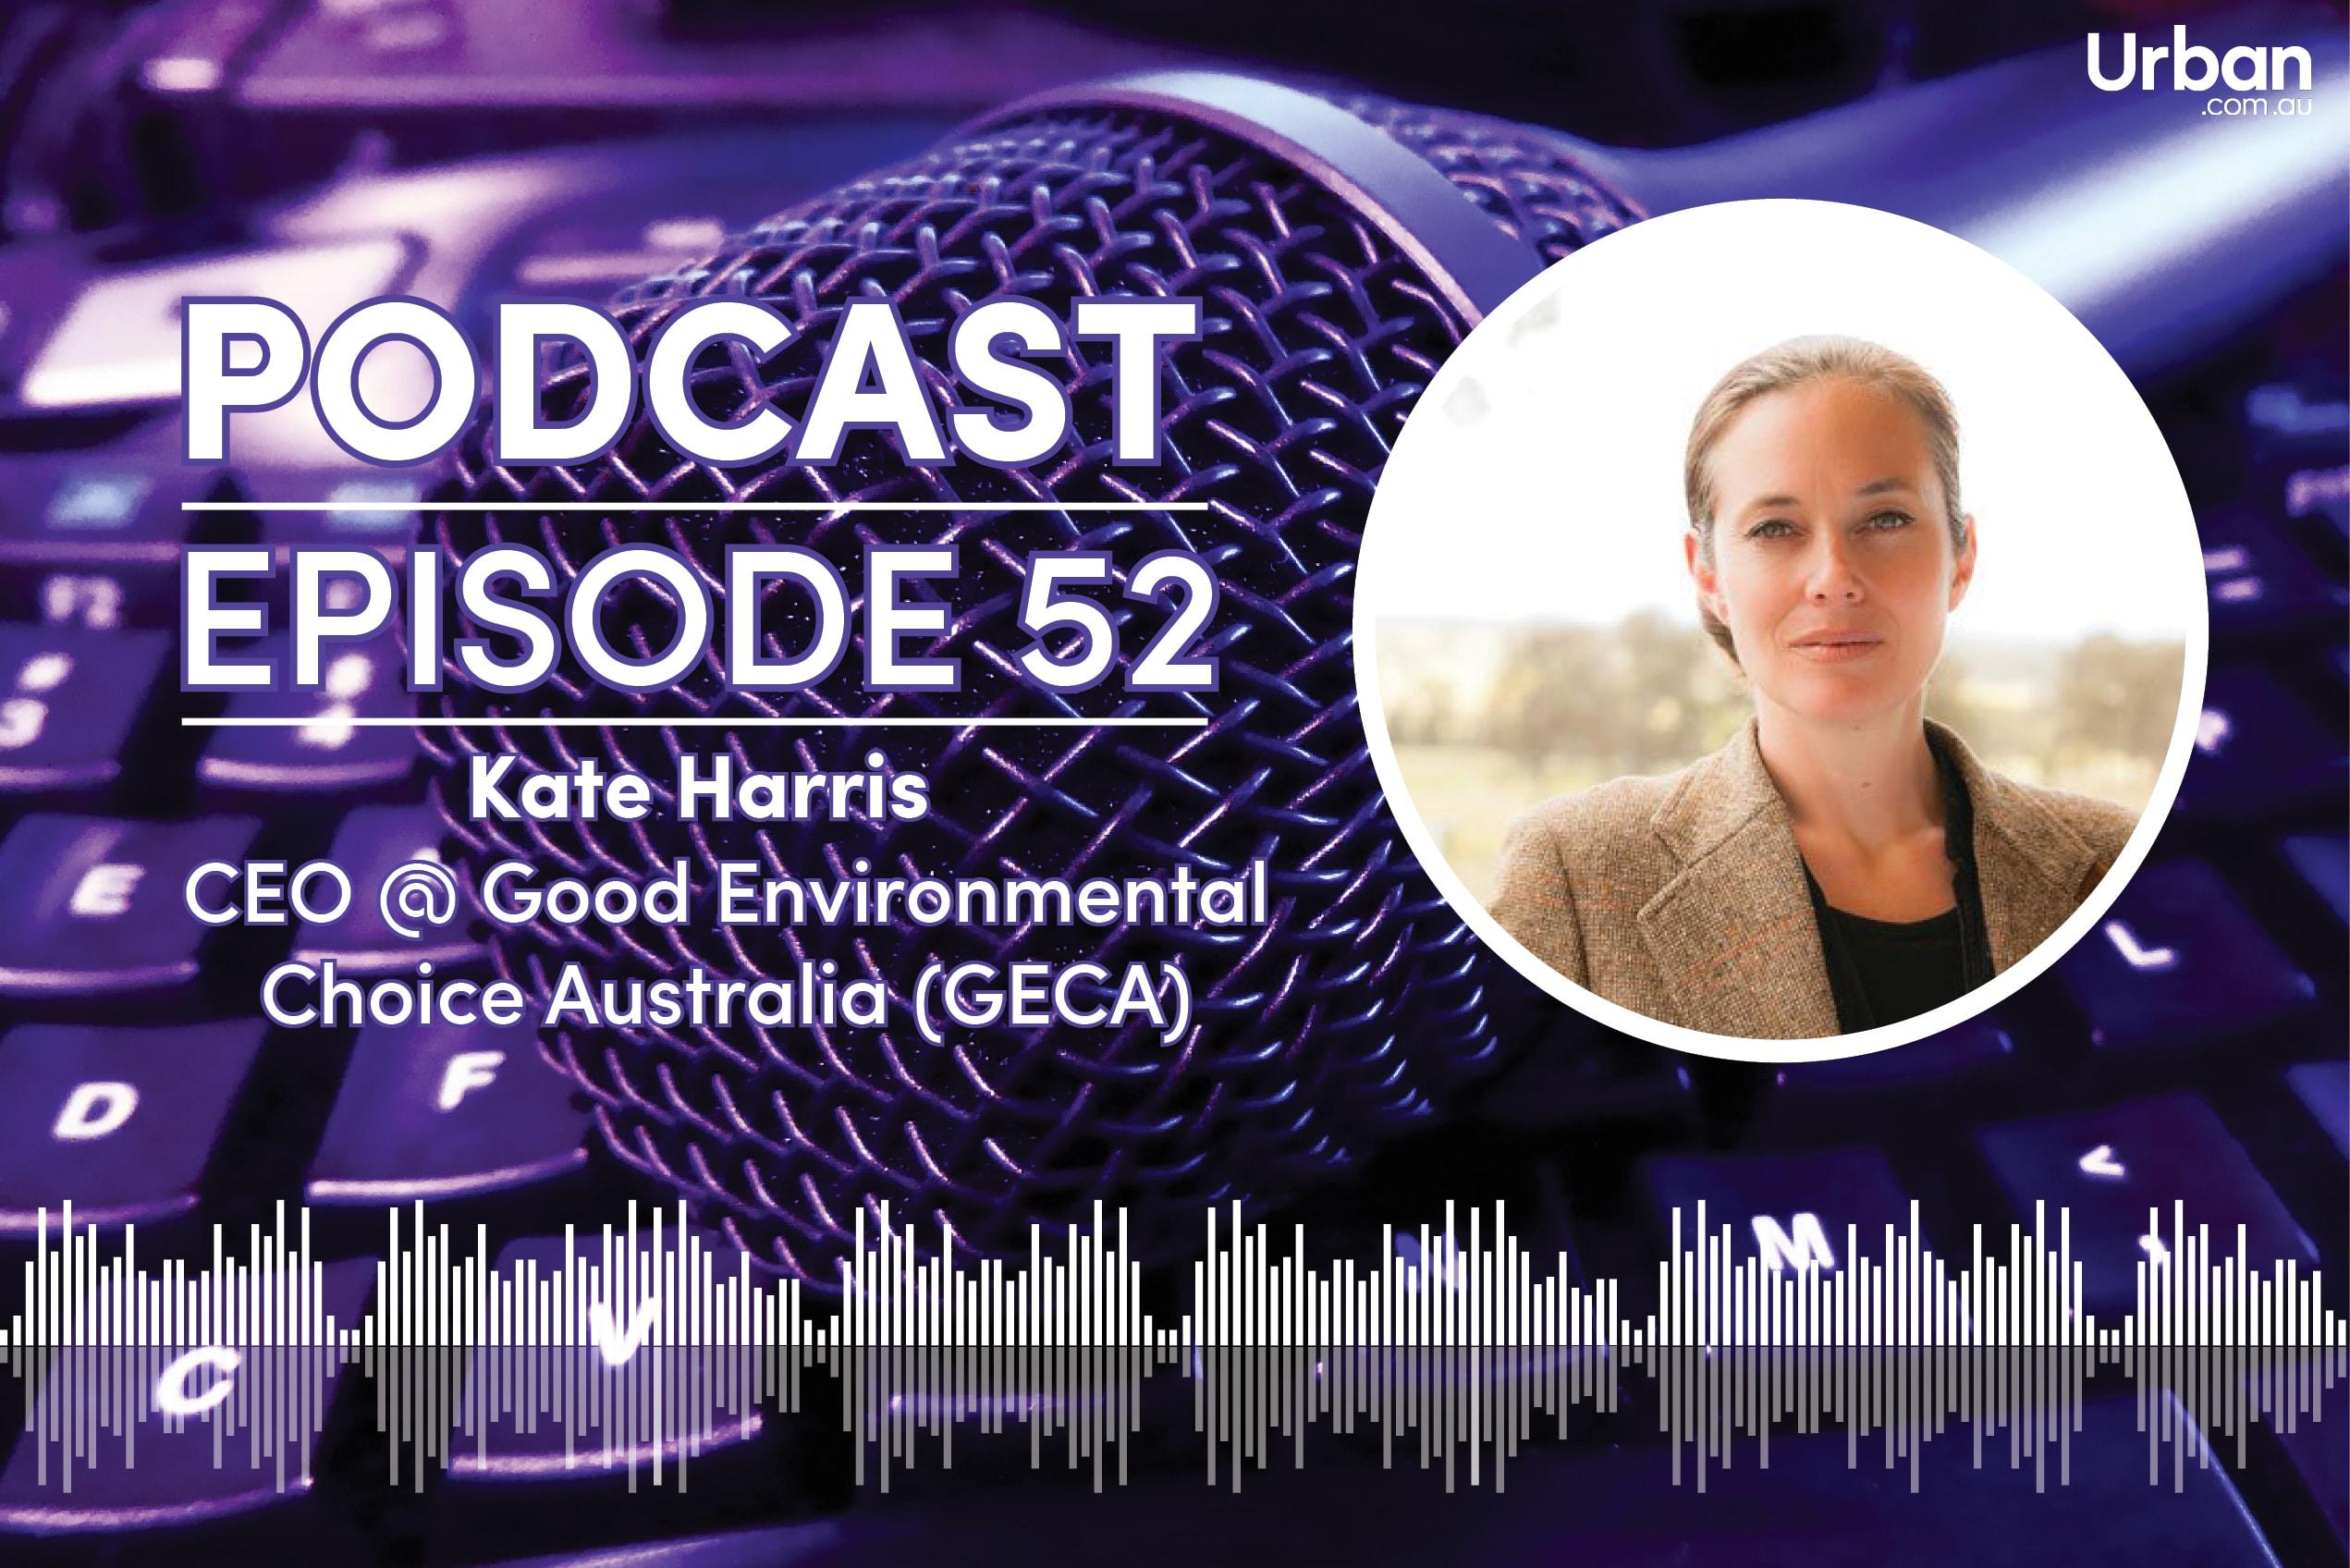 Podcast - Episode 52: GECA CEO Kate Harris